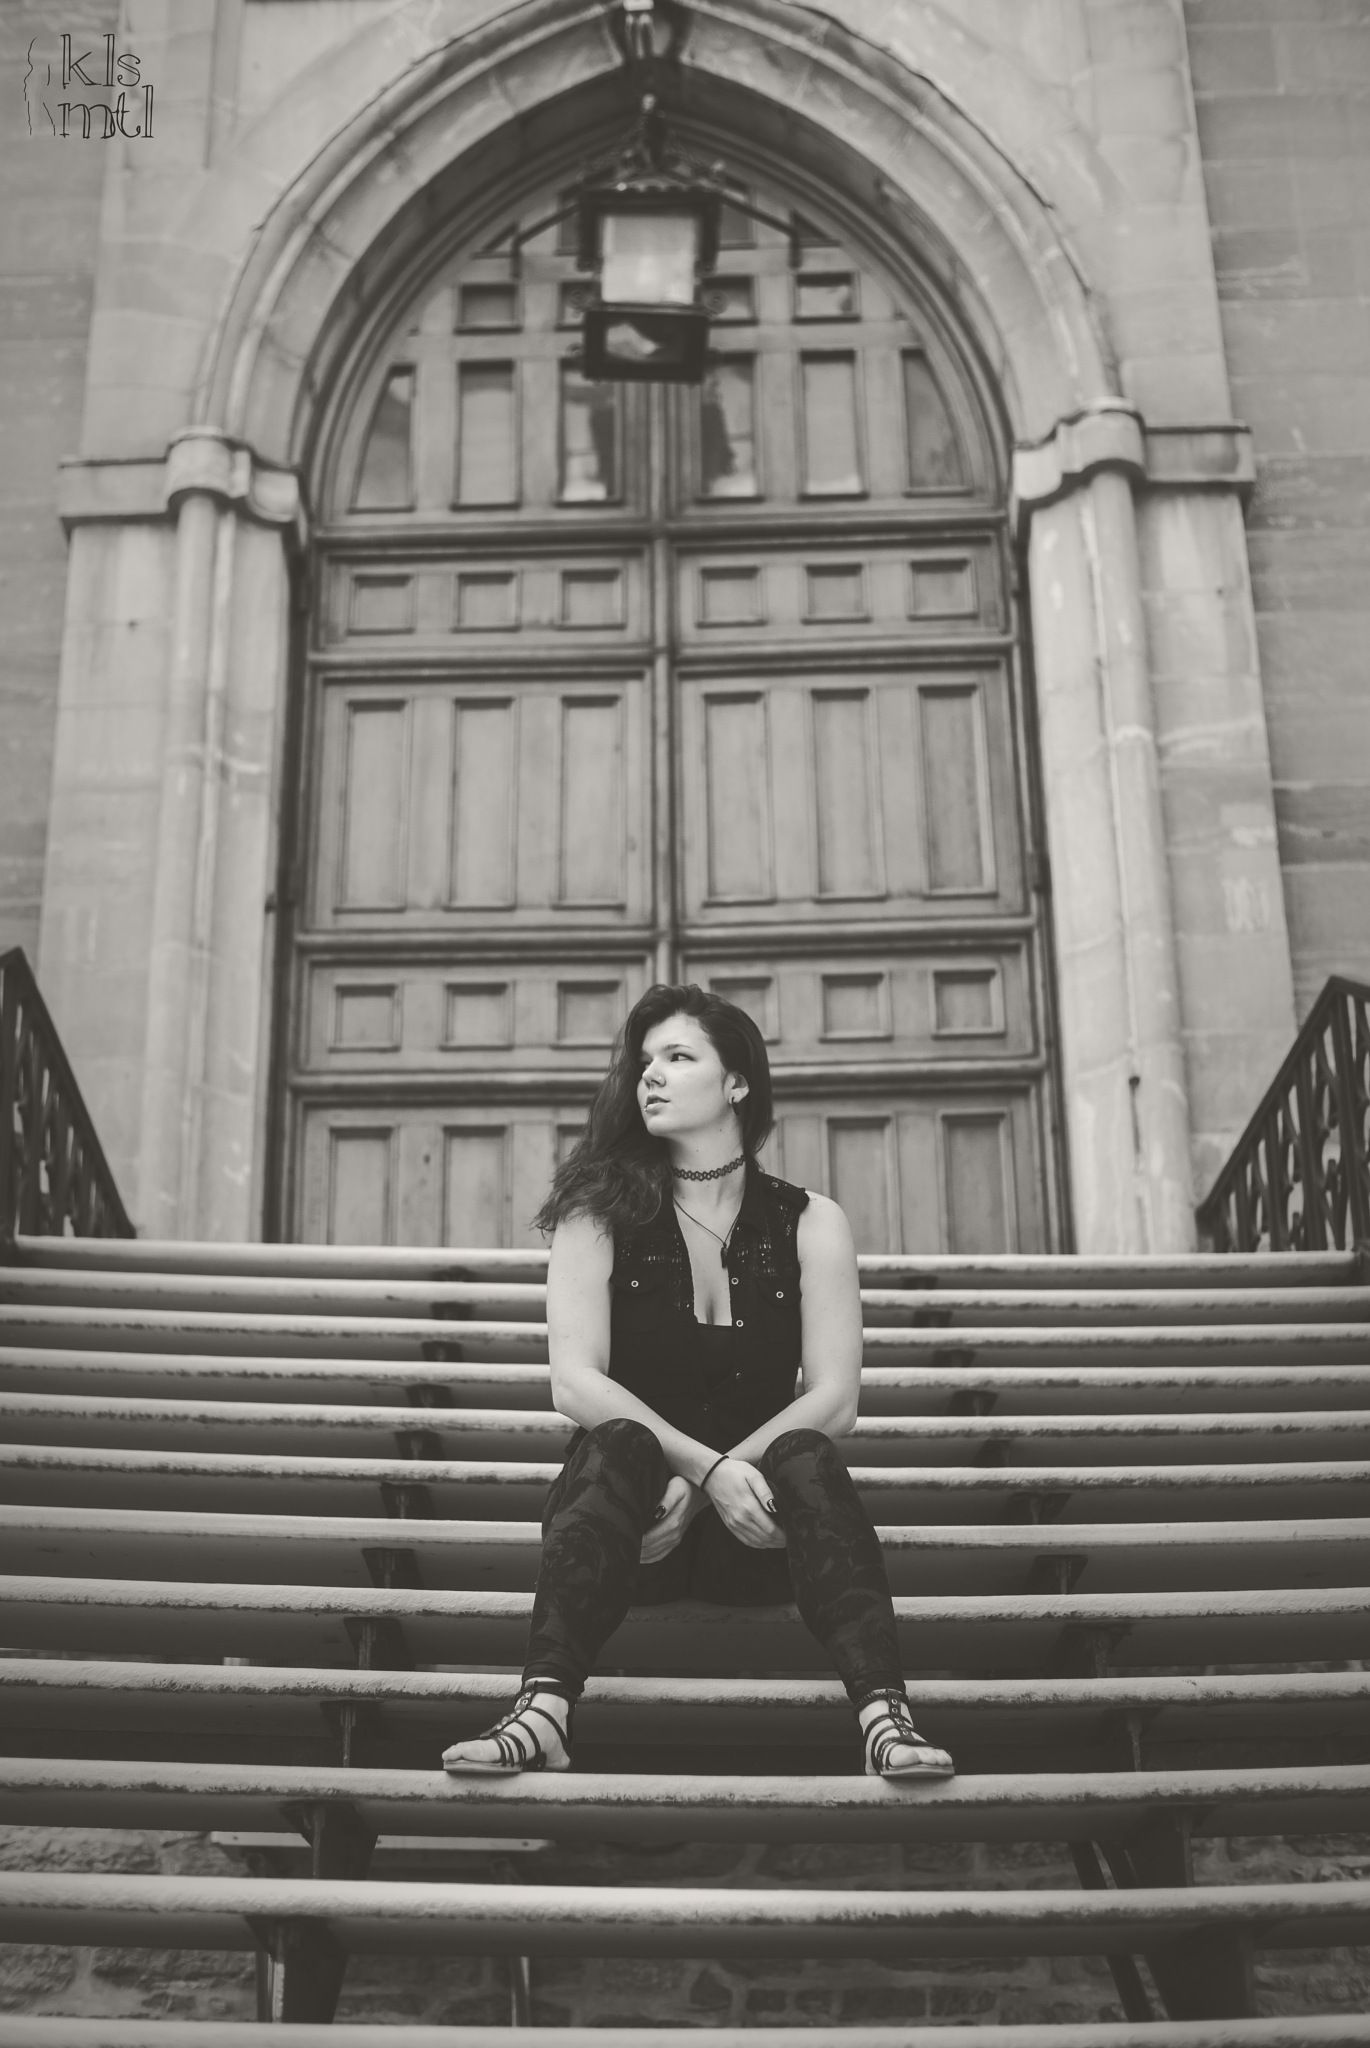 Church Doors by K-Liss